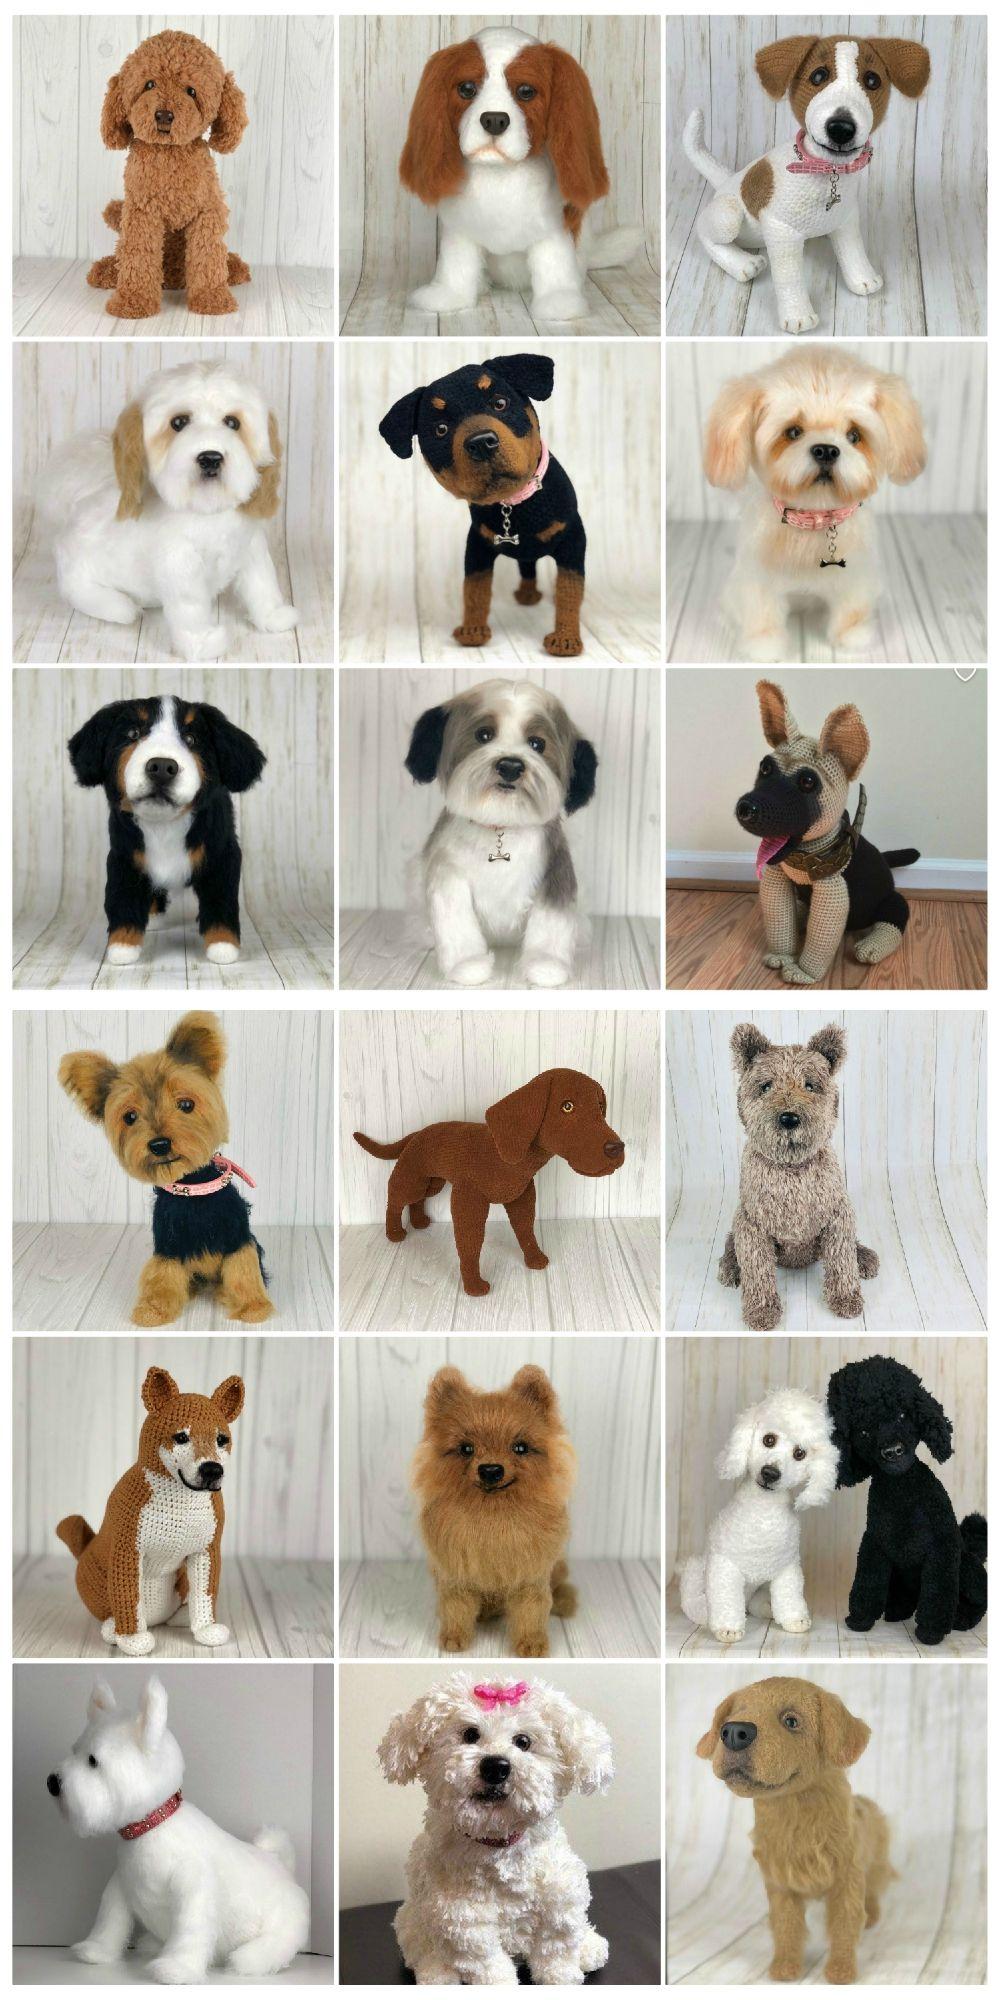 Dog Crochet Pattern Pinterest Top Pins - The WHOot